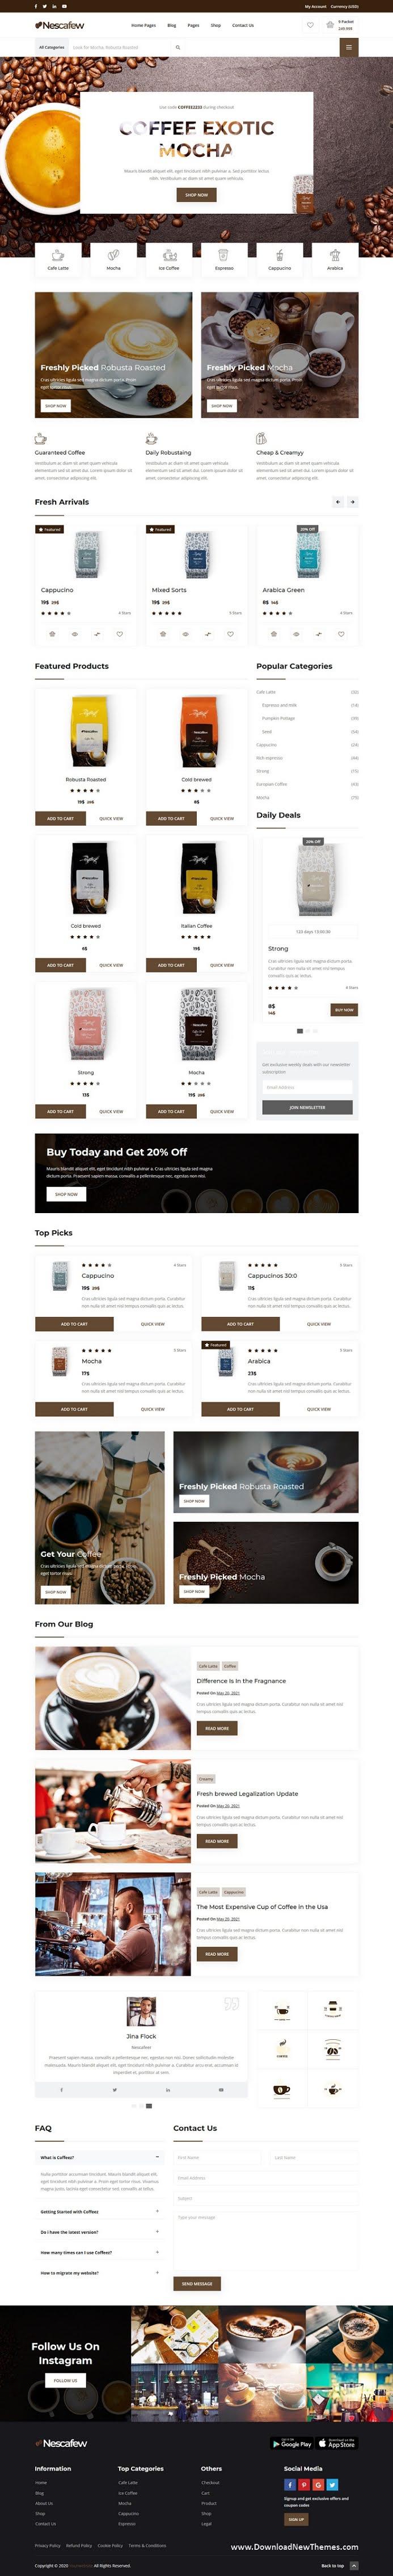 Best Coffee Shop Website Template